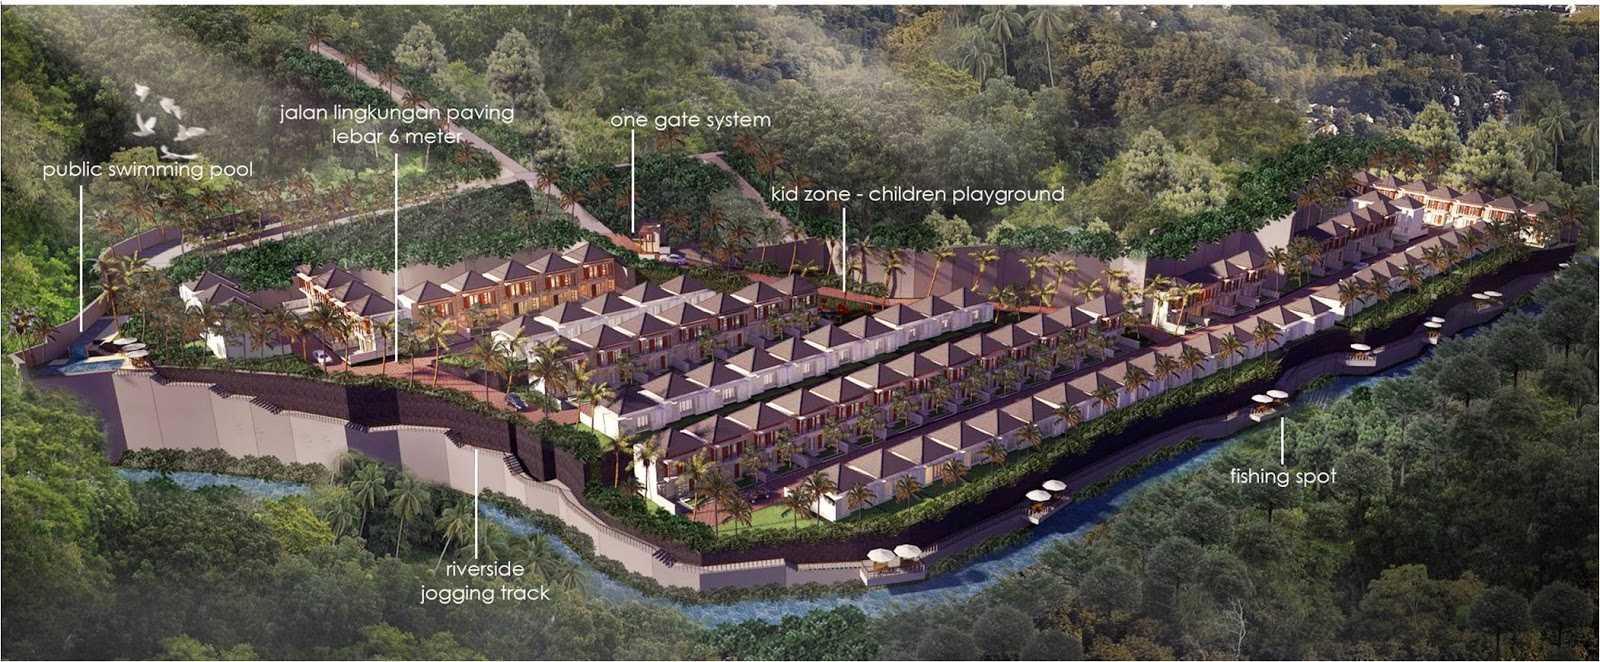 Hg Architects & Designers Associates Denbantas Riverview Residences Tabanan, Bali Tabanan, Bali Bird Eye View   24190